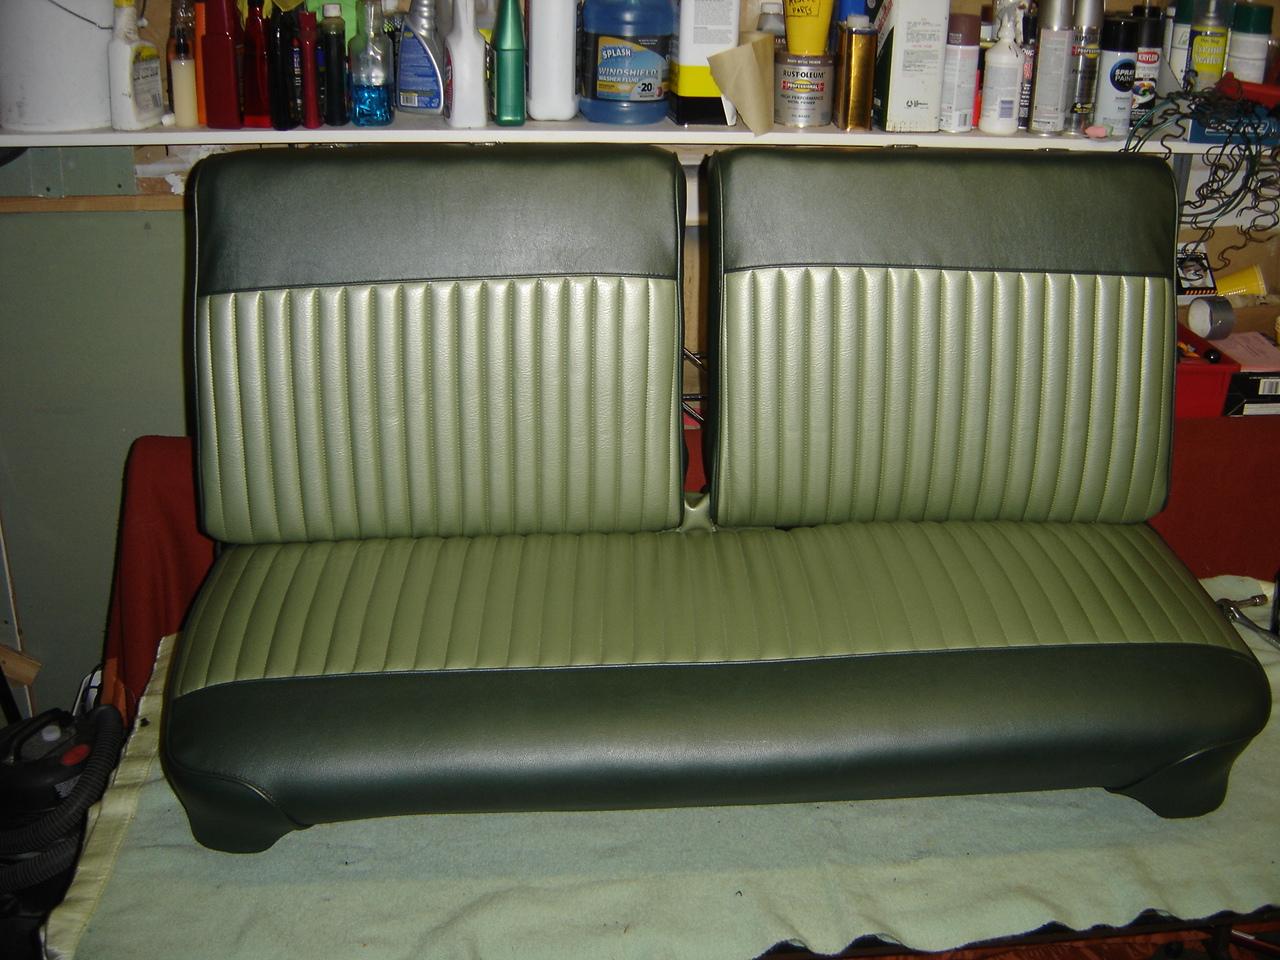 1970 Dodge Dart Bench Seat Restoration